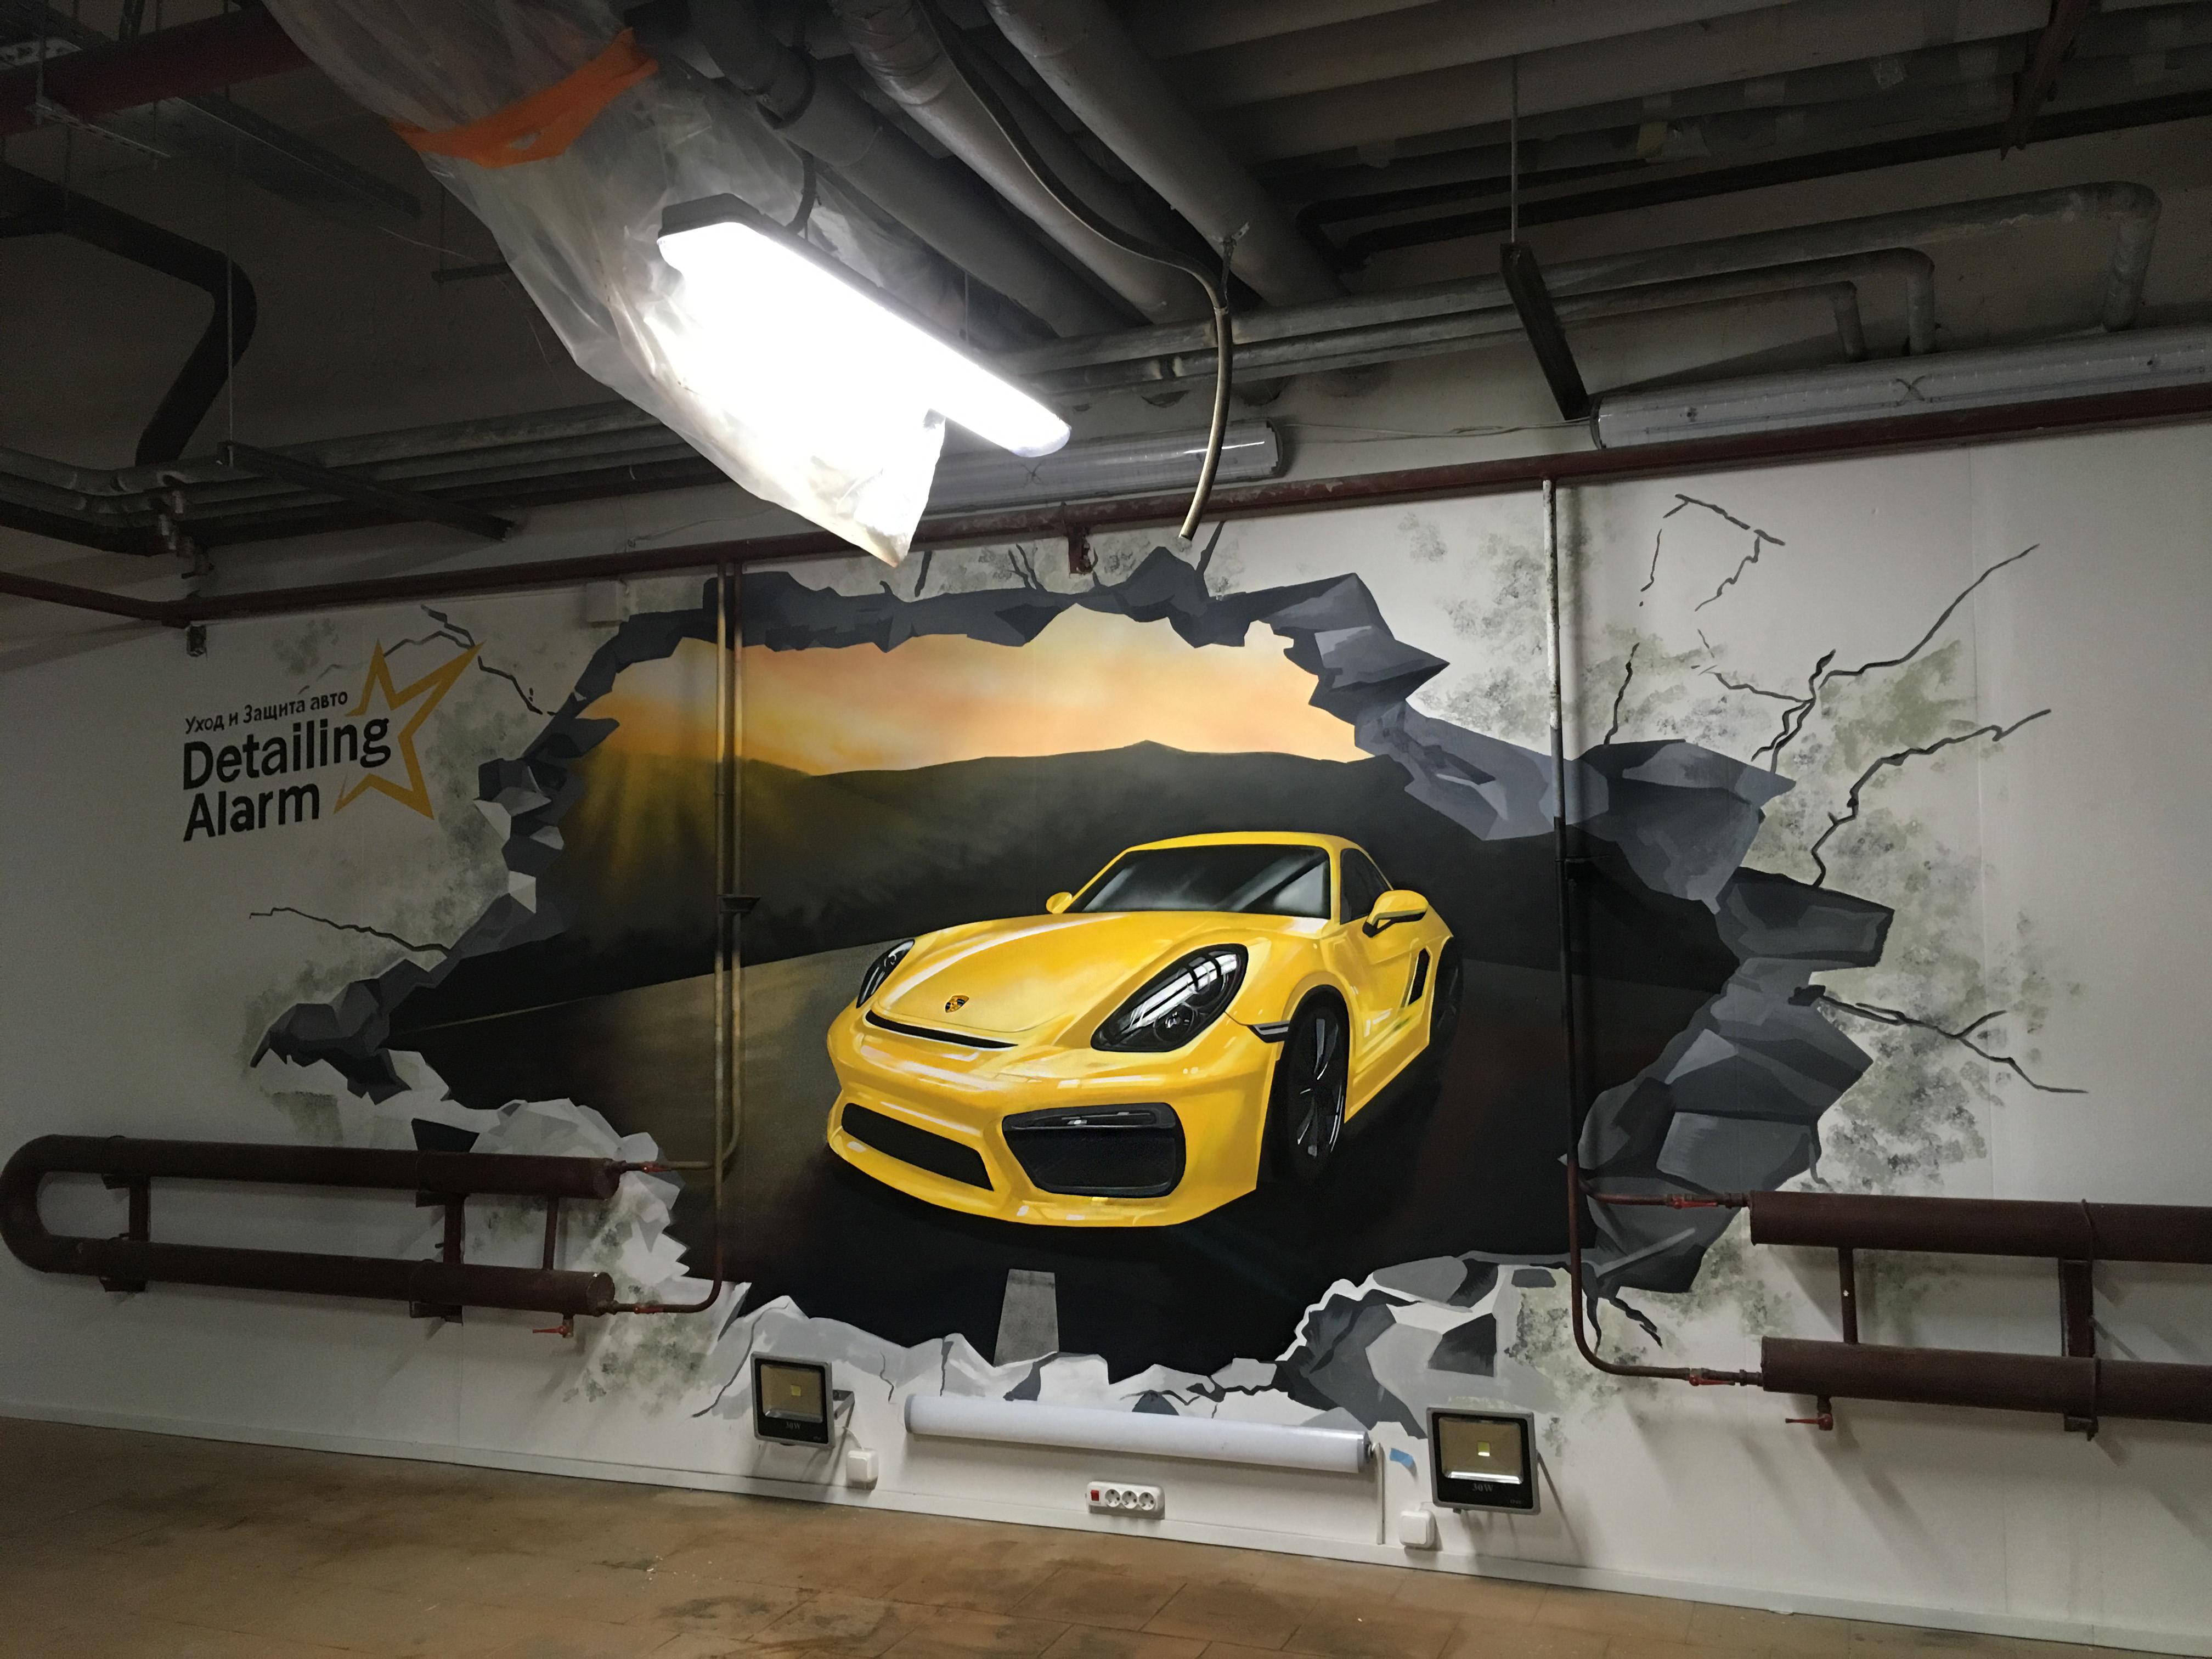 аэрография машина рисунок на стене граффити _ porsche car graffiti on the broken wall